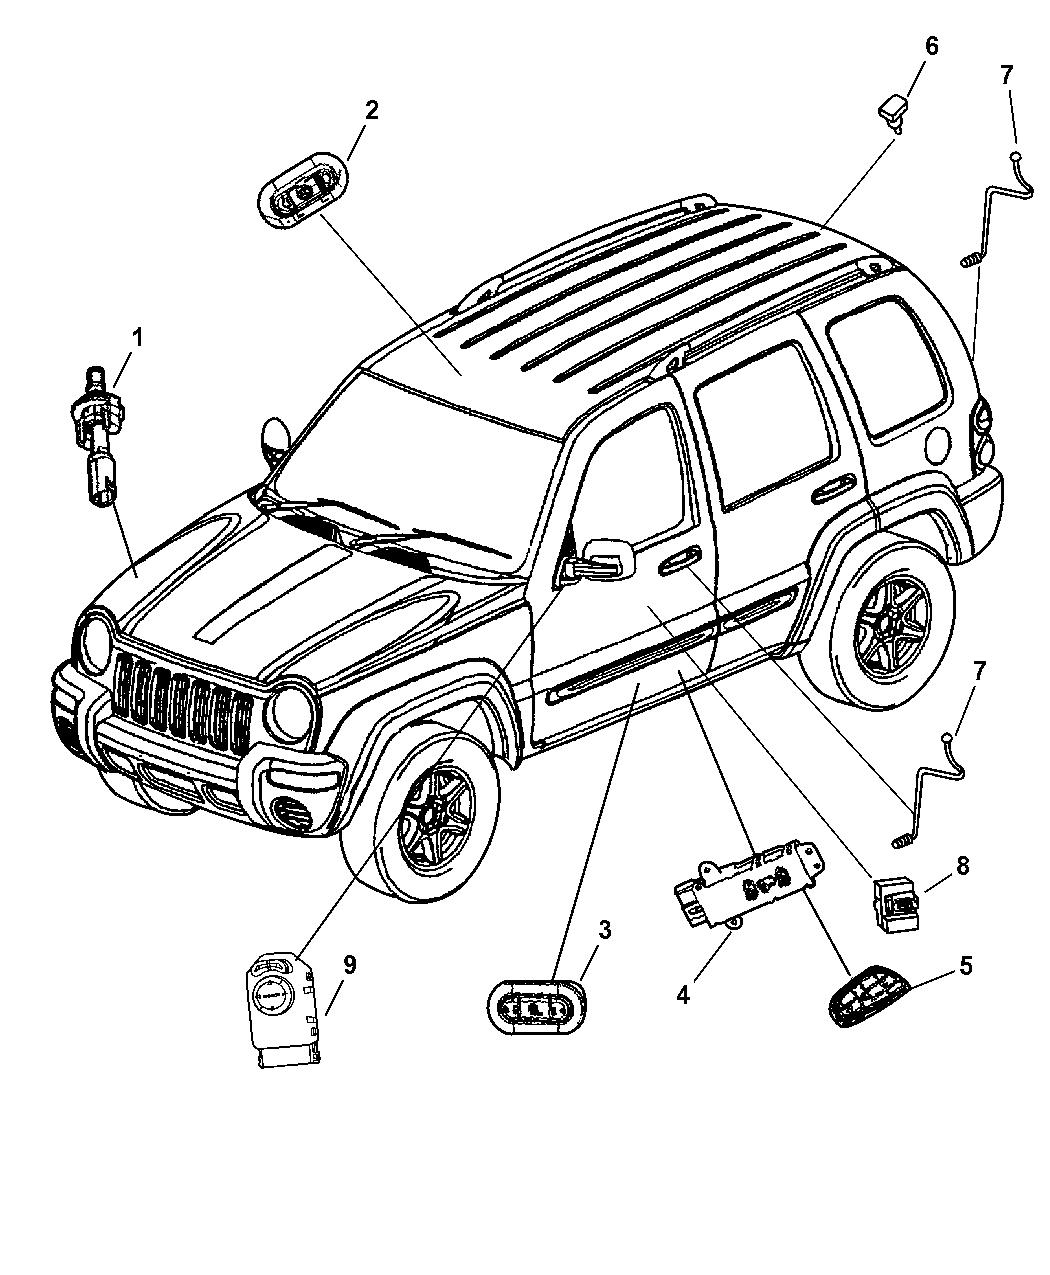 56010695aa